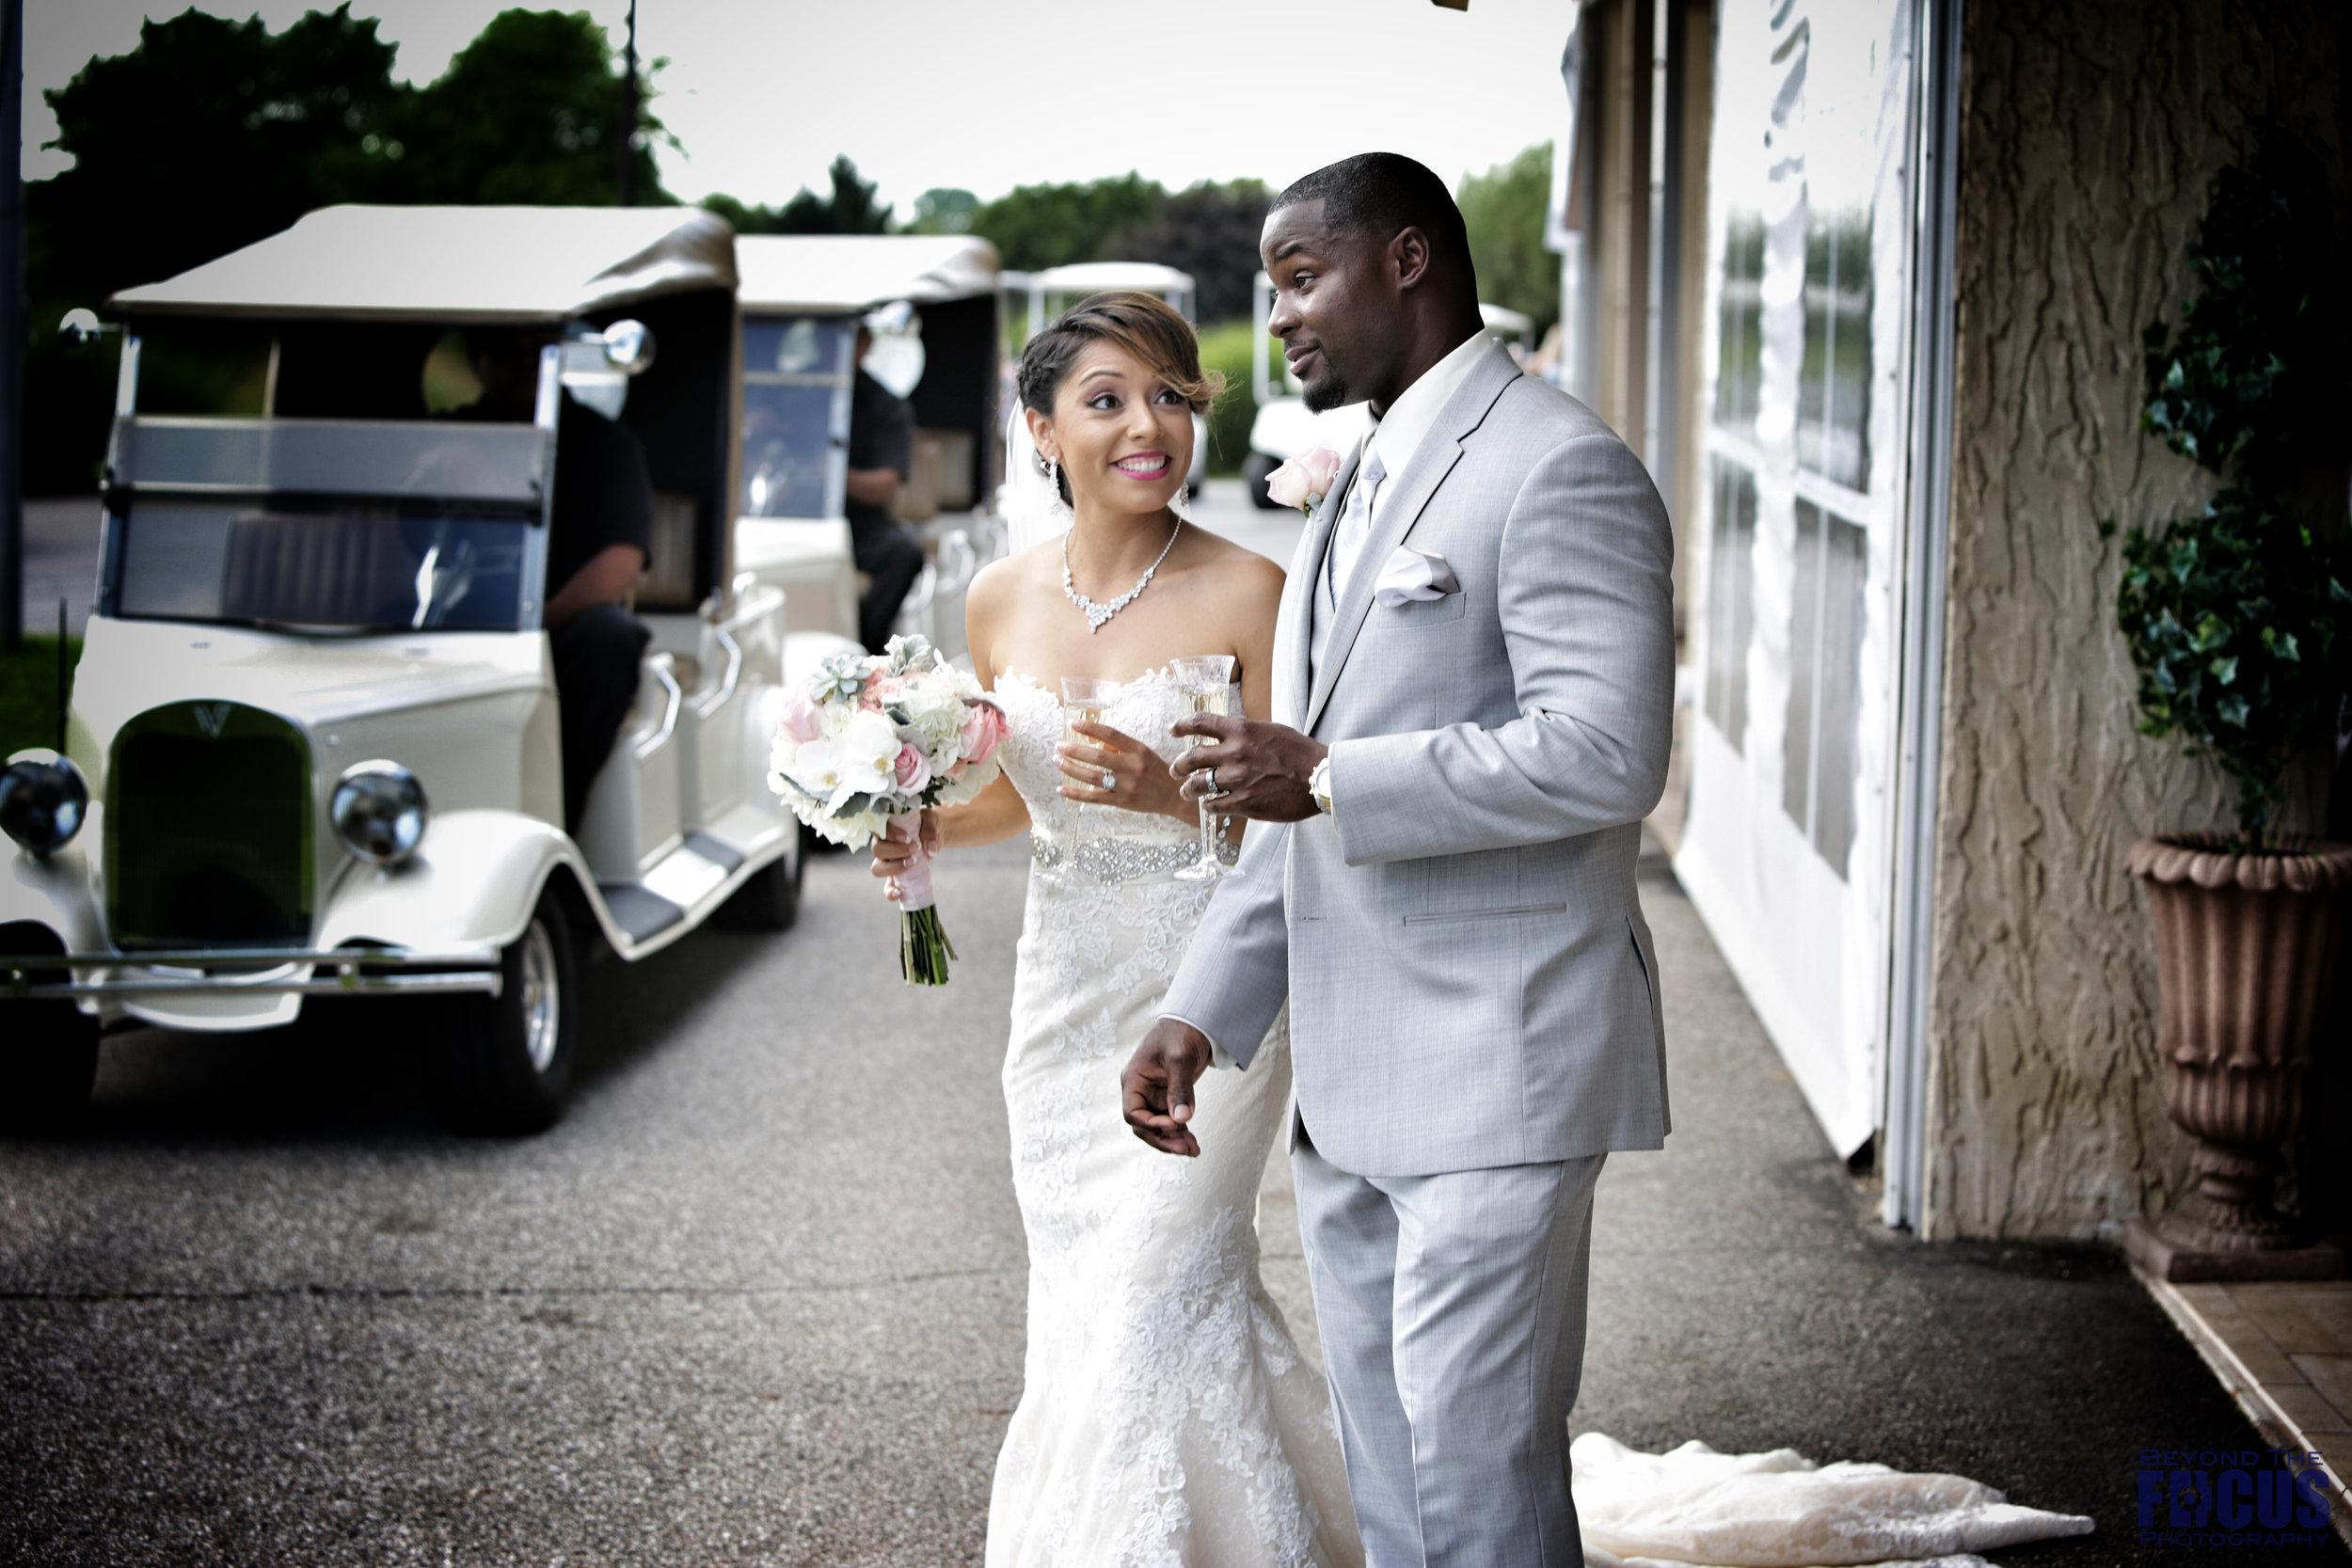 Palmer Wedding - Wedding Ceremony57.jpg